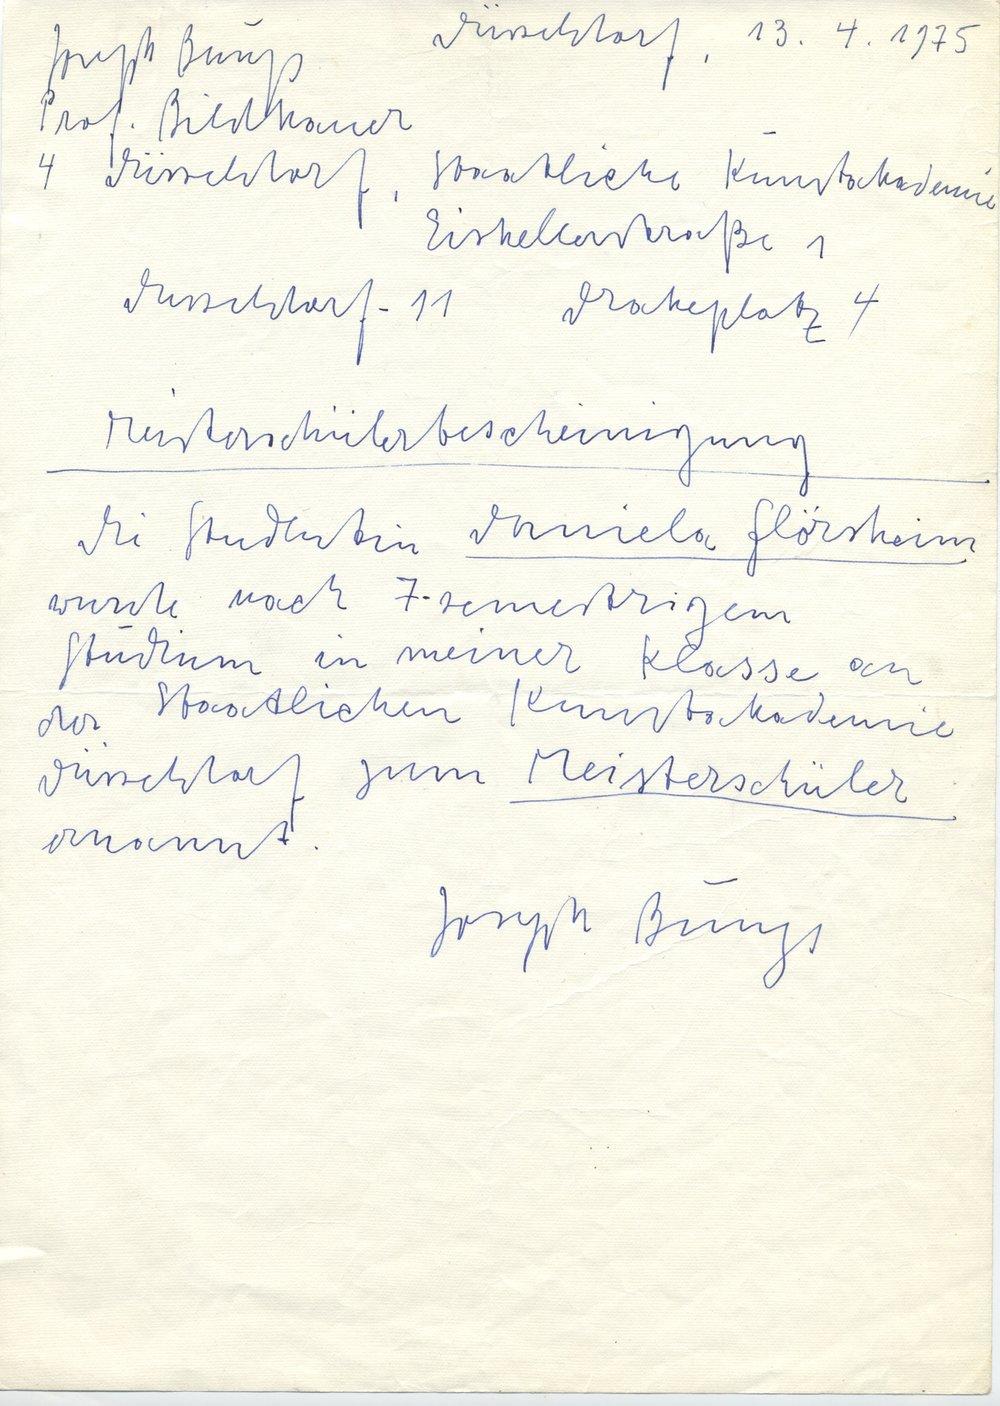 Meisterbrief Joseph Beuys